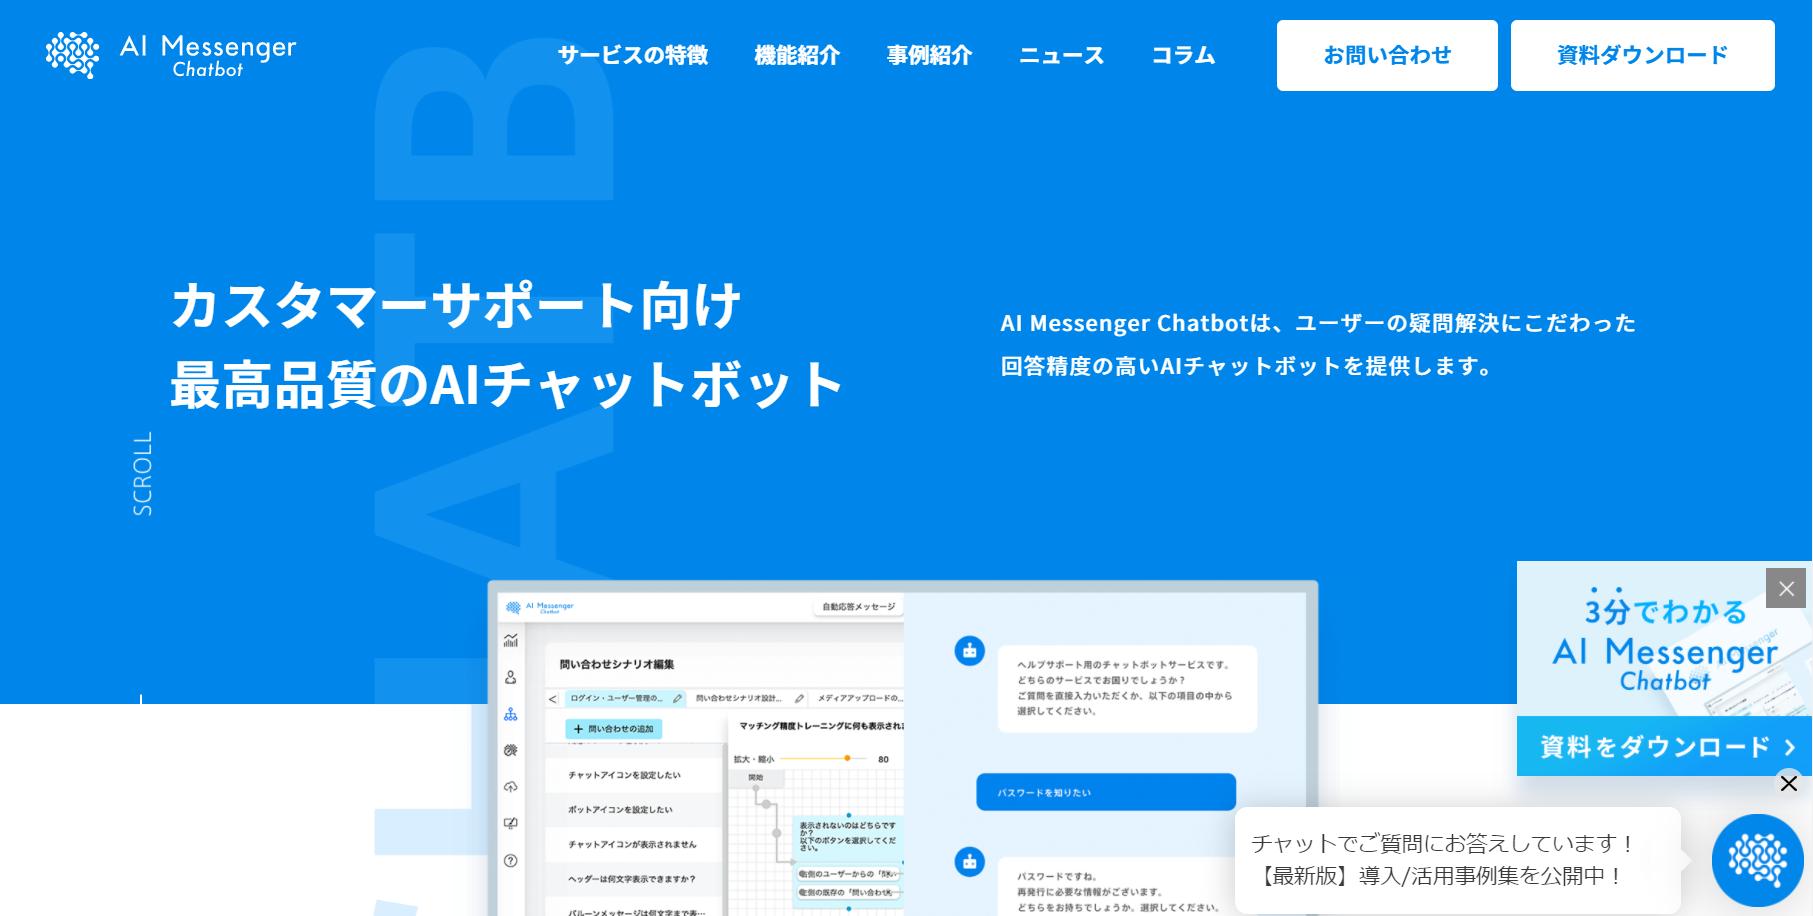 AI Messenger Chatbot